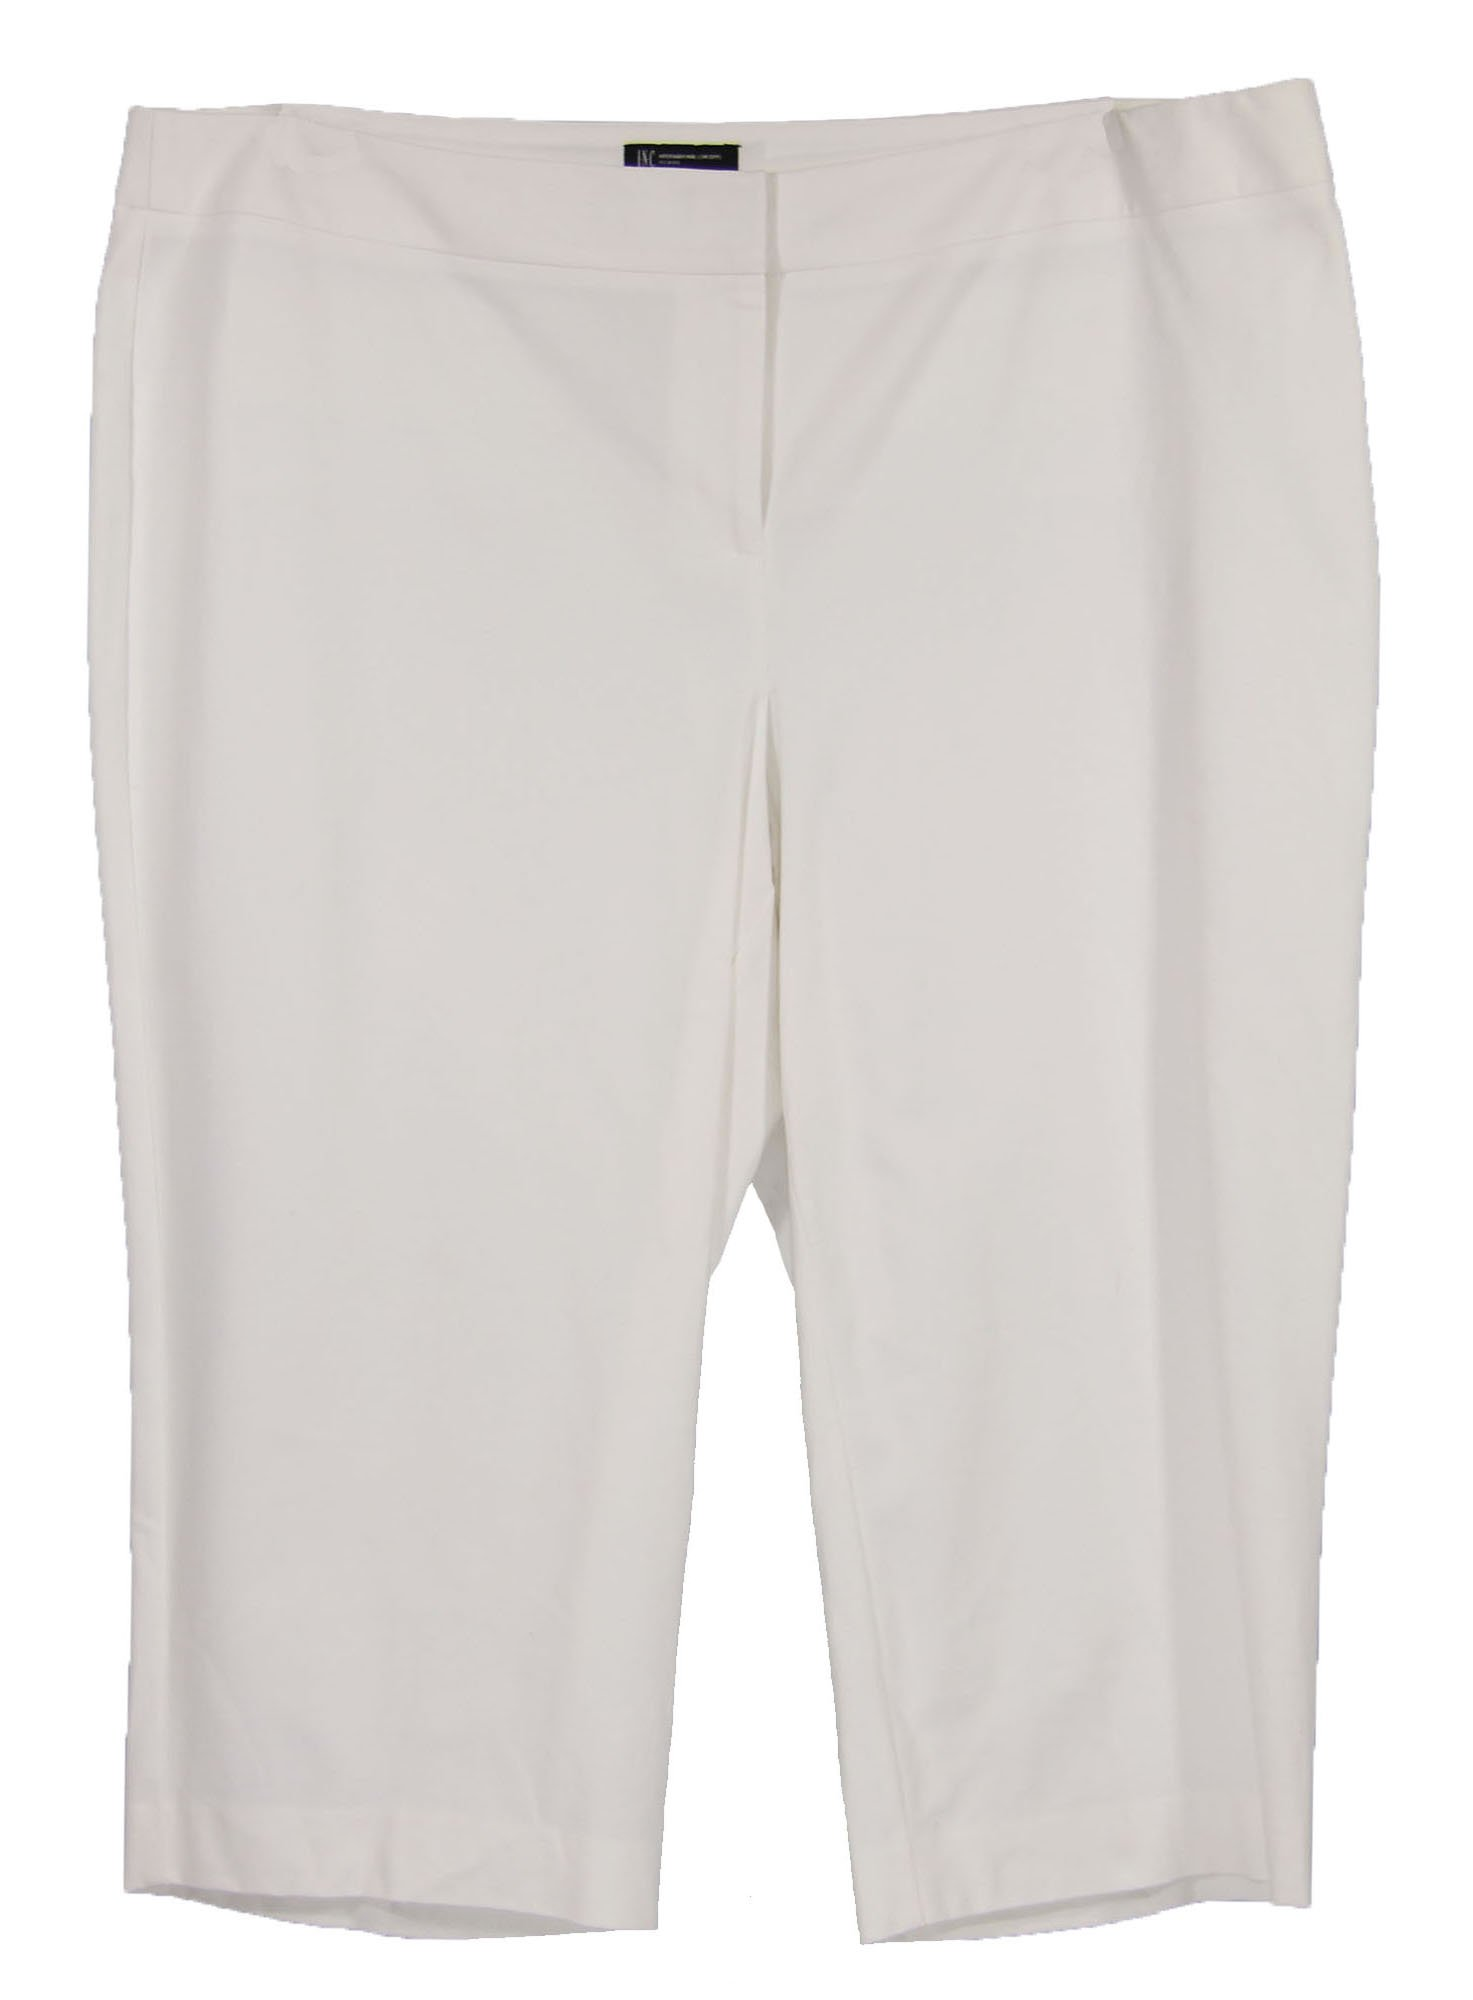 INC Women's Plus Size Straight Leg Capri Pants 20w White